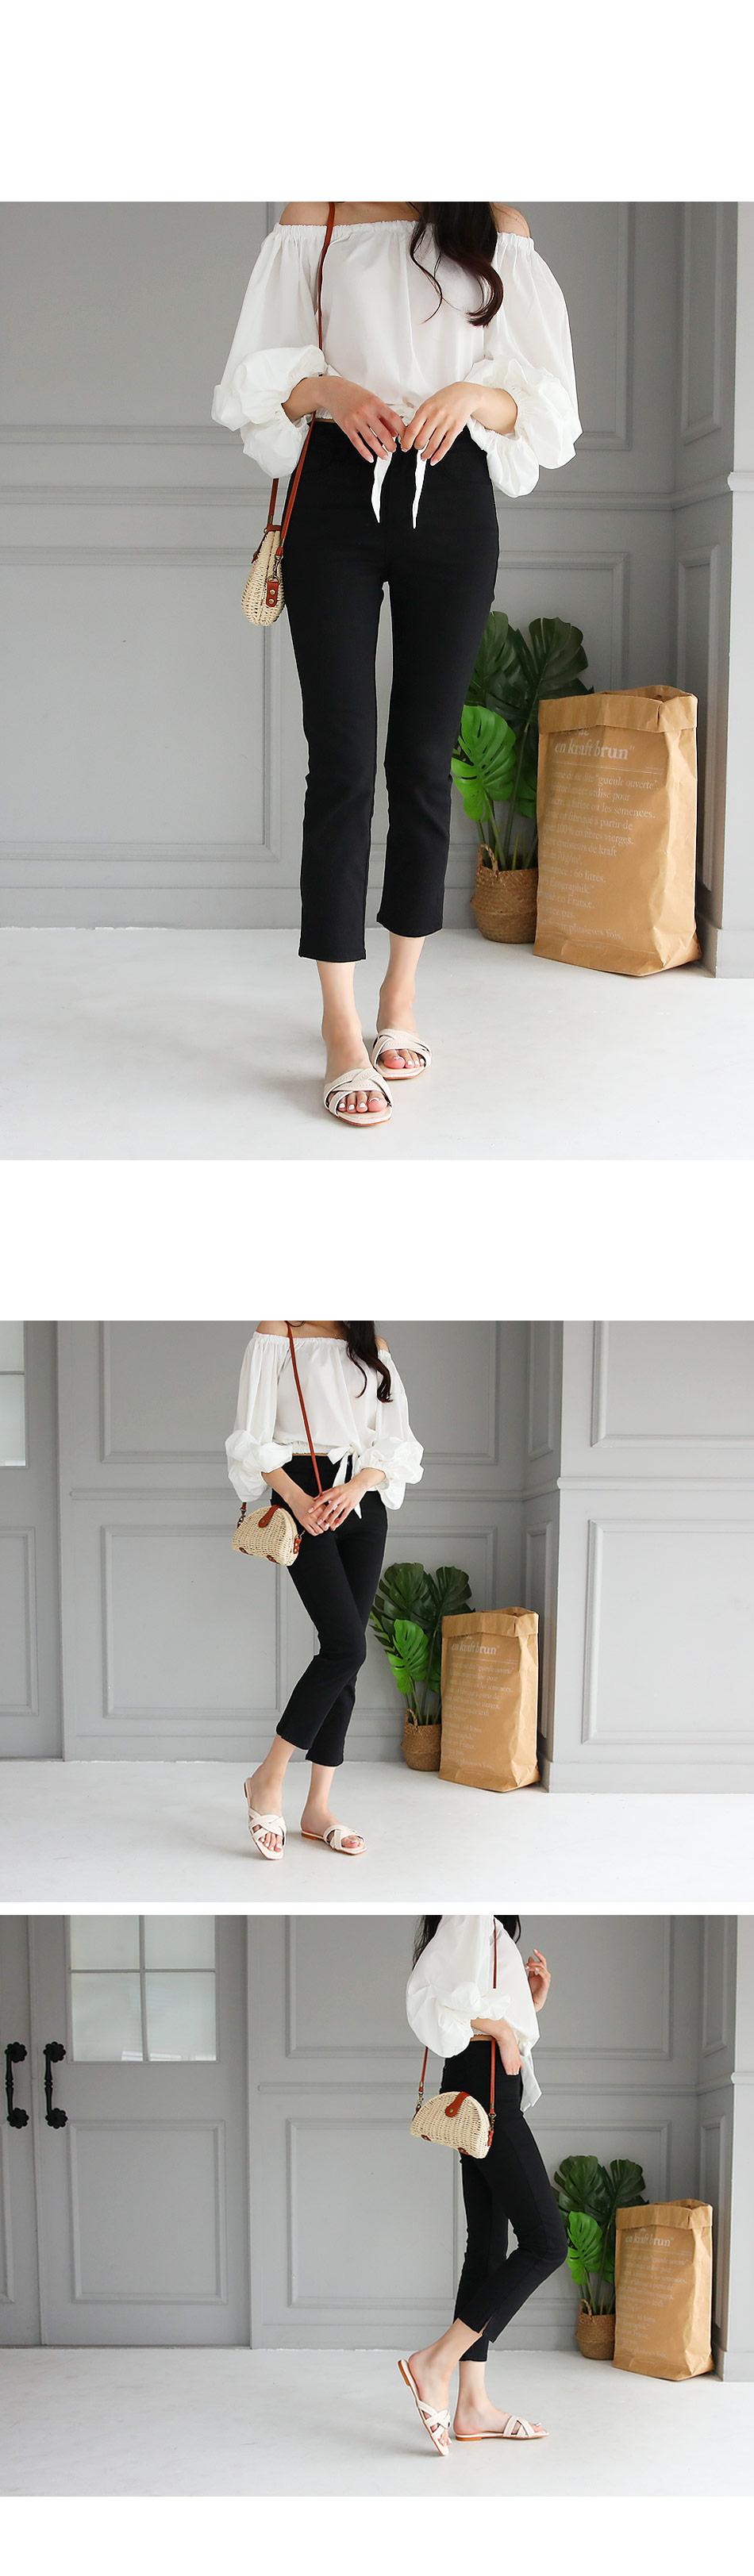 Denny Slippers 1cm